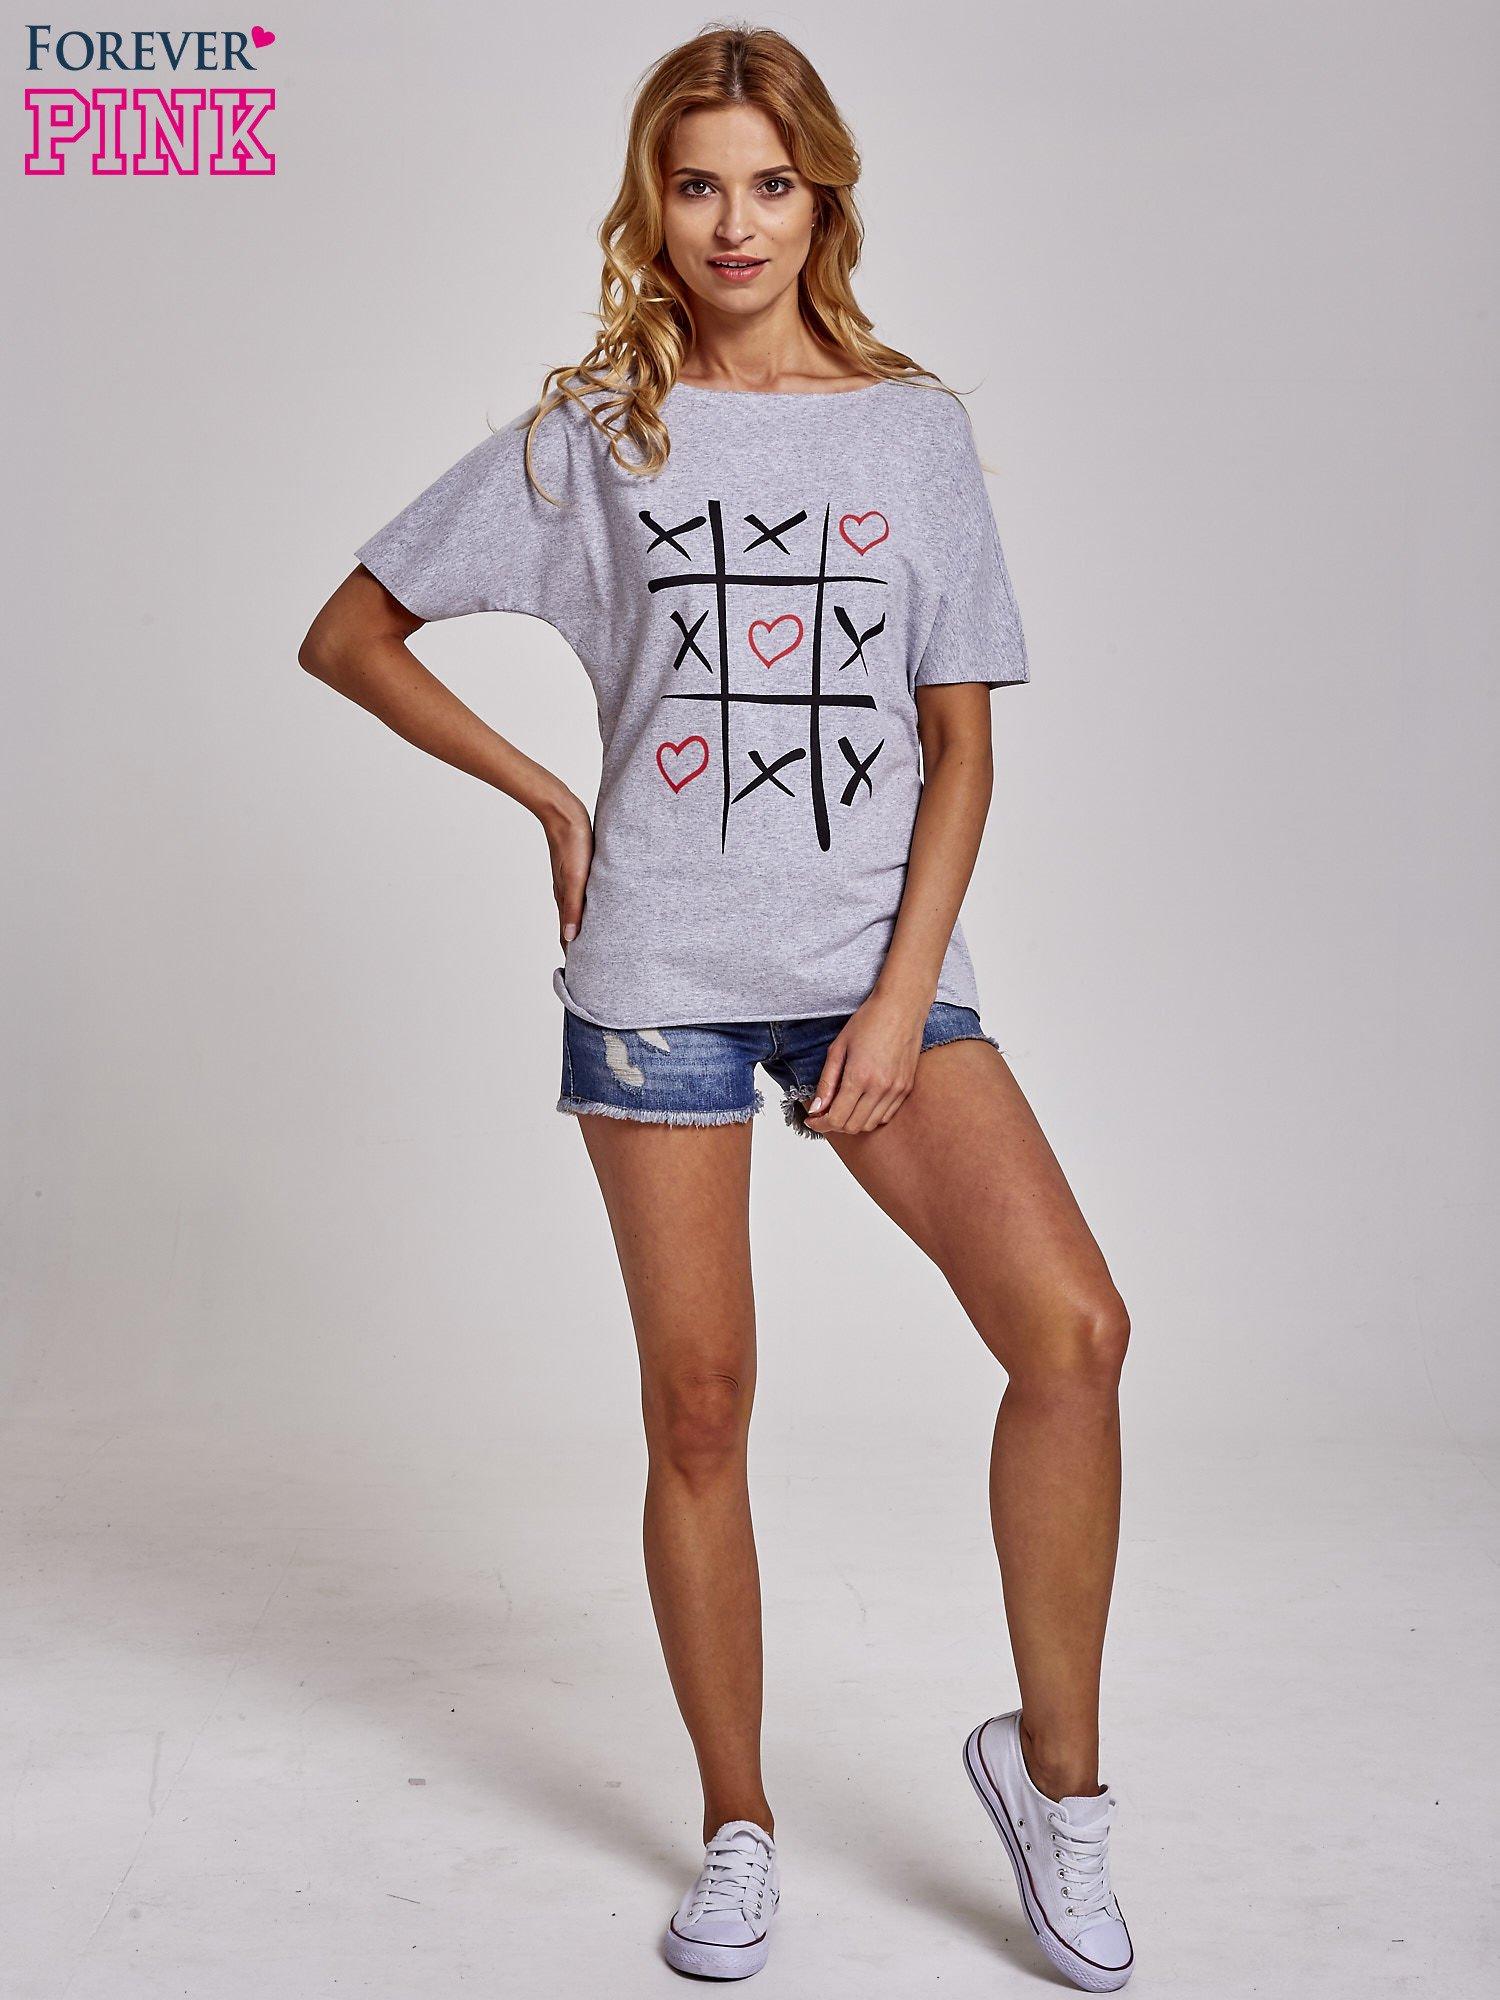 Szary t-shirt z motywem serce i krzyżyk                                  zdj.                                  2